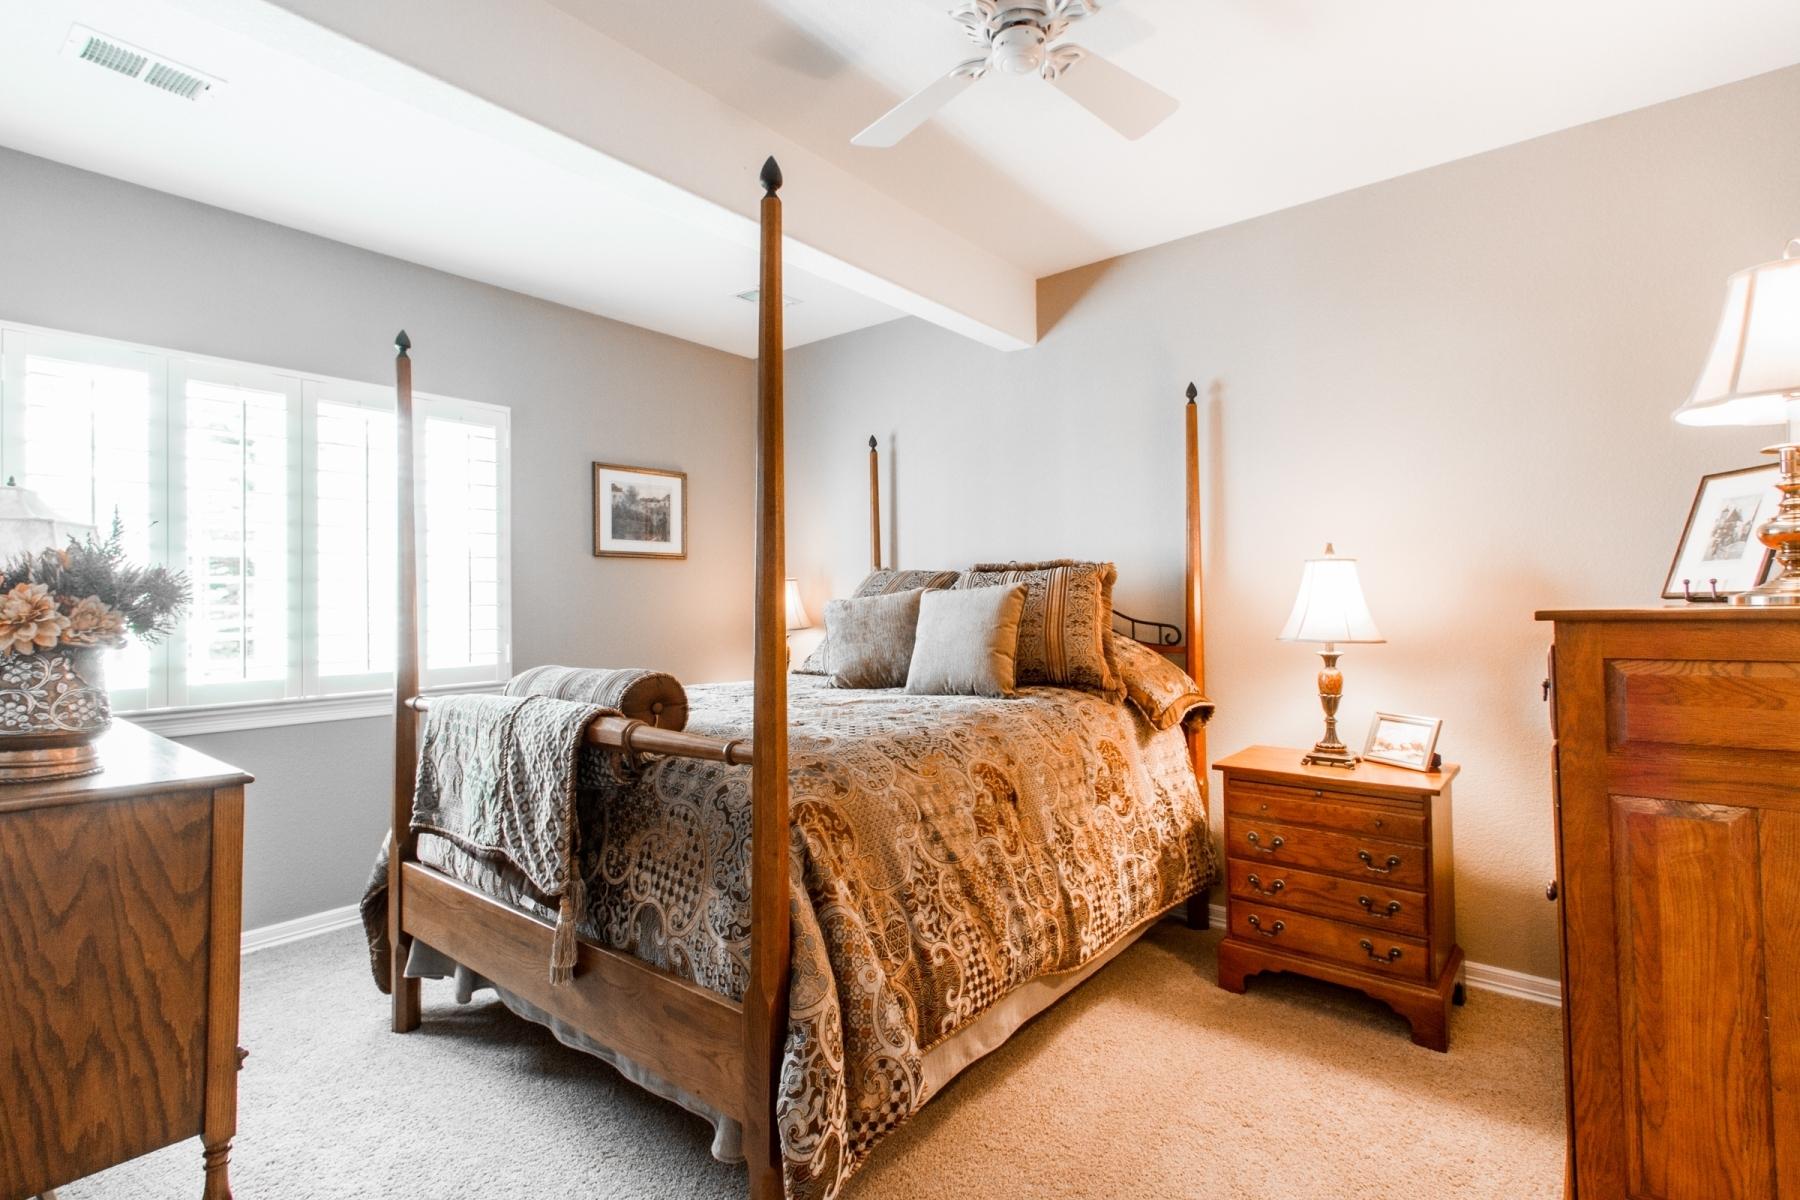 Bedroom-Three_1800x1200_2768898.jpg